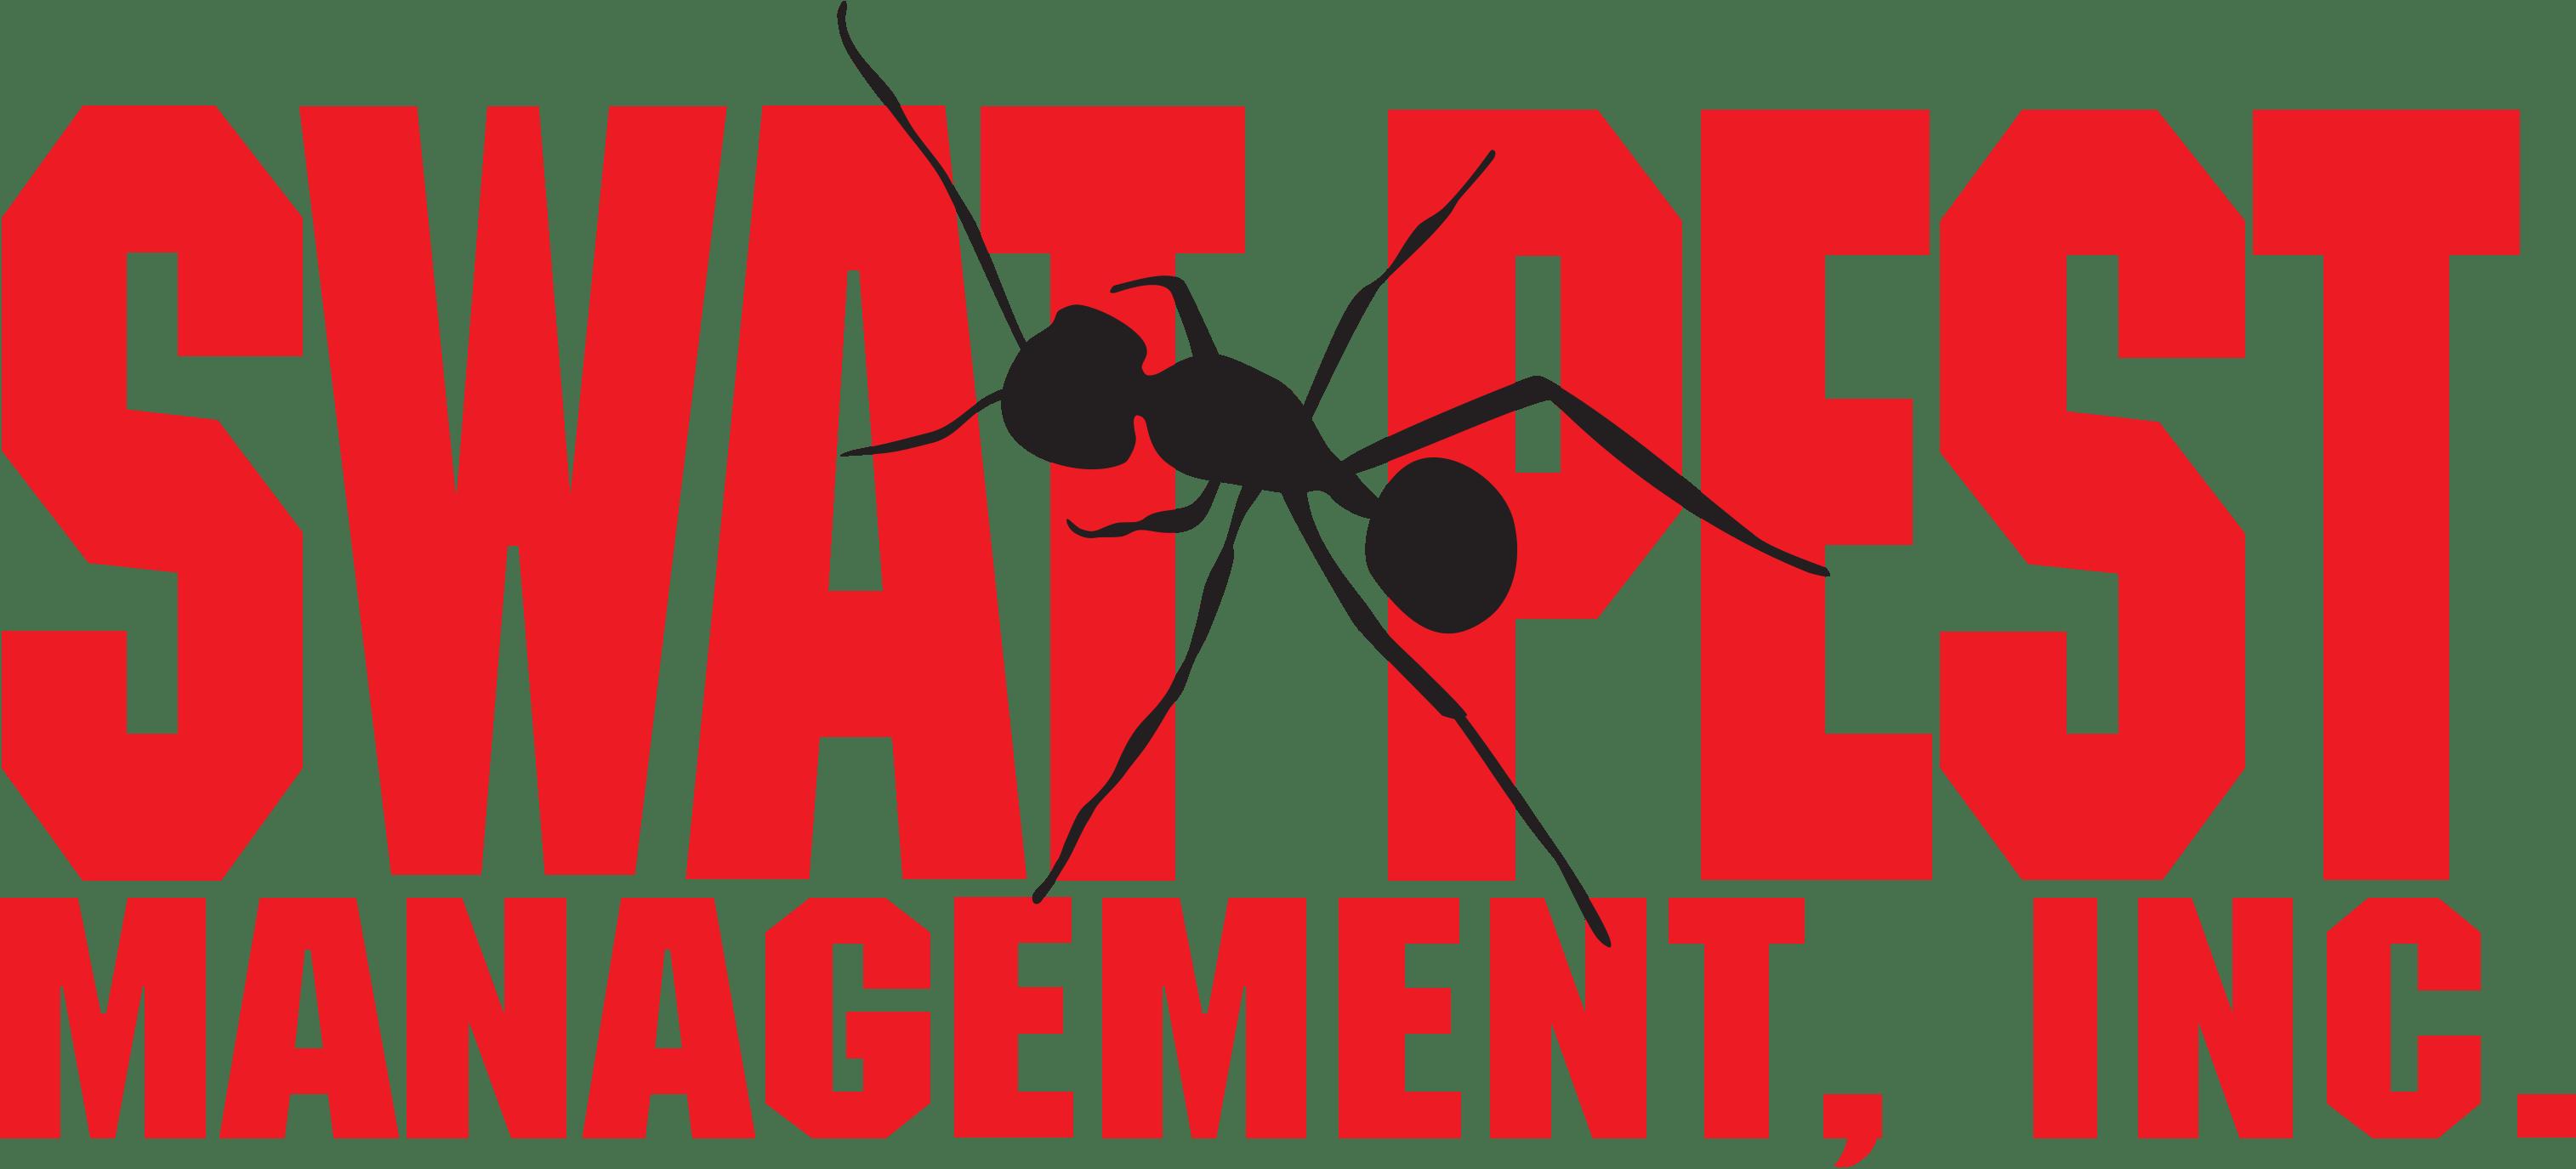 Swat Pest | Pest Control Specialist in Evansville, Indiana